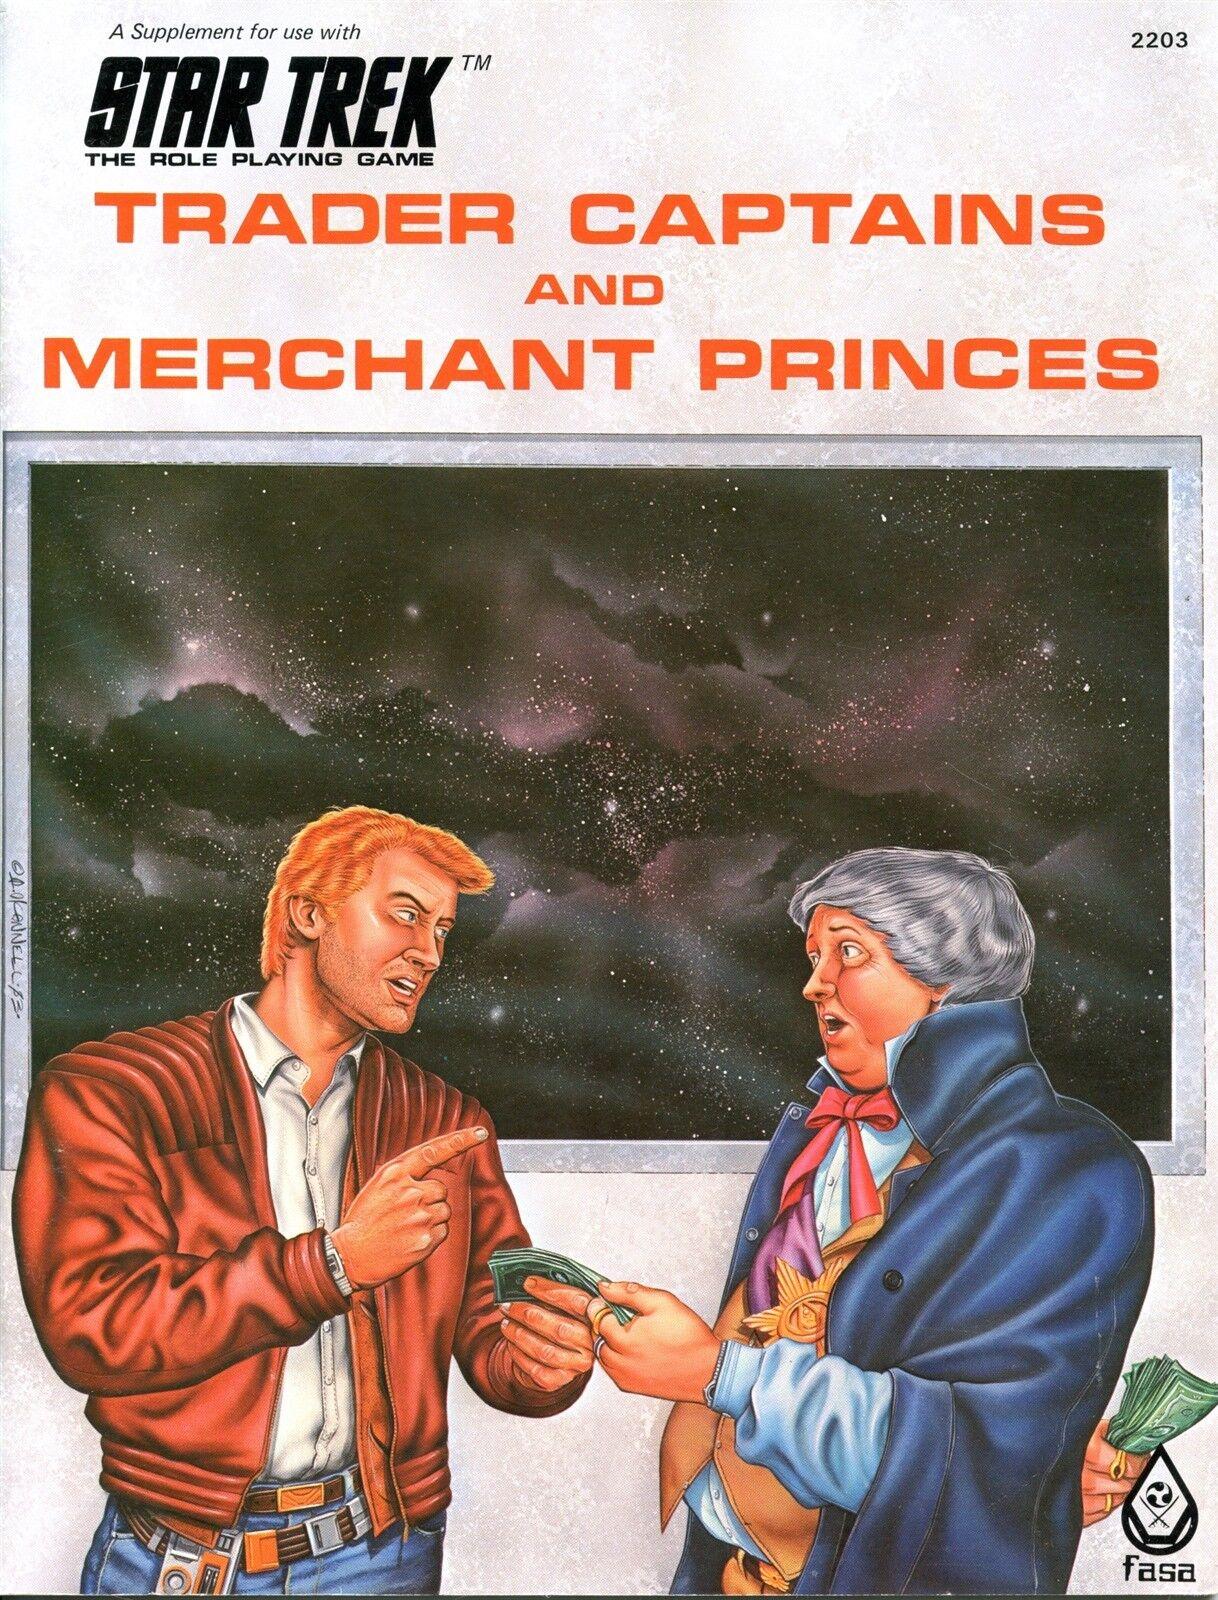 STAR TREK TRADER CAPTAINS AND MERCHANT PRINCES 2203 FASA RPG EXC+